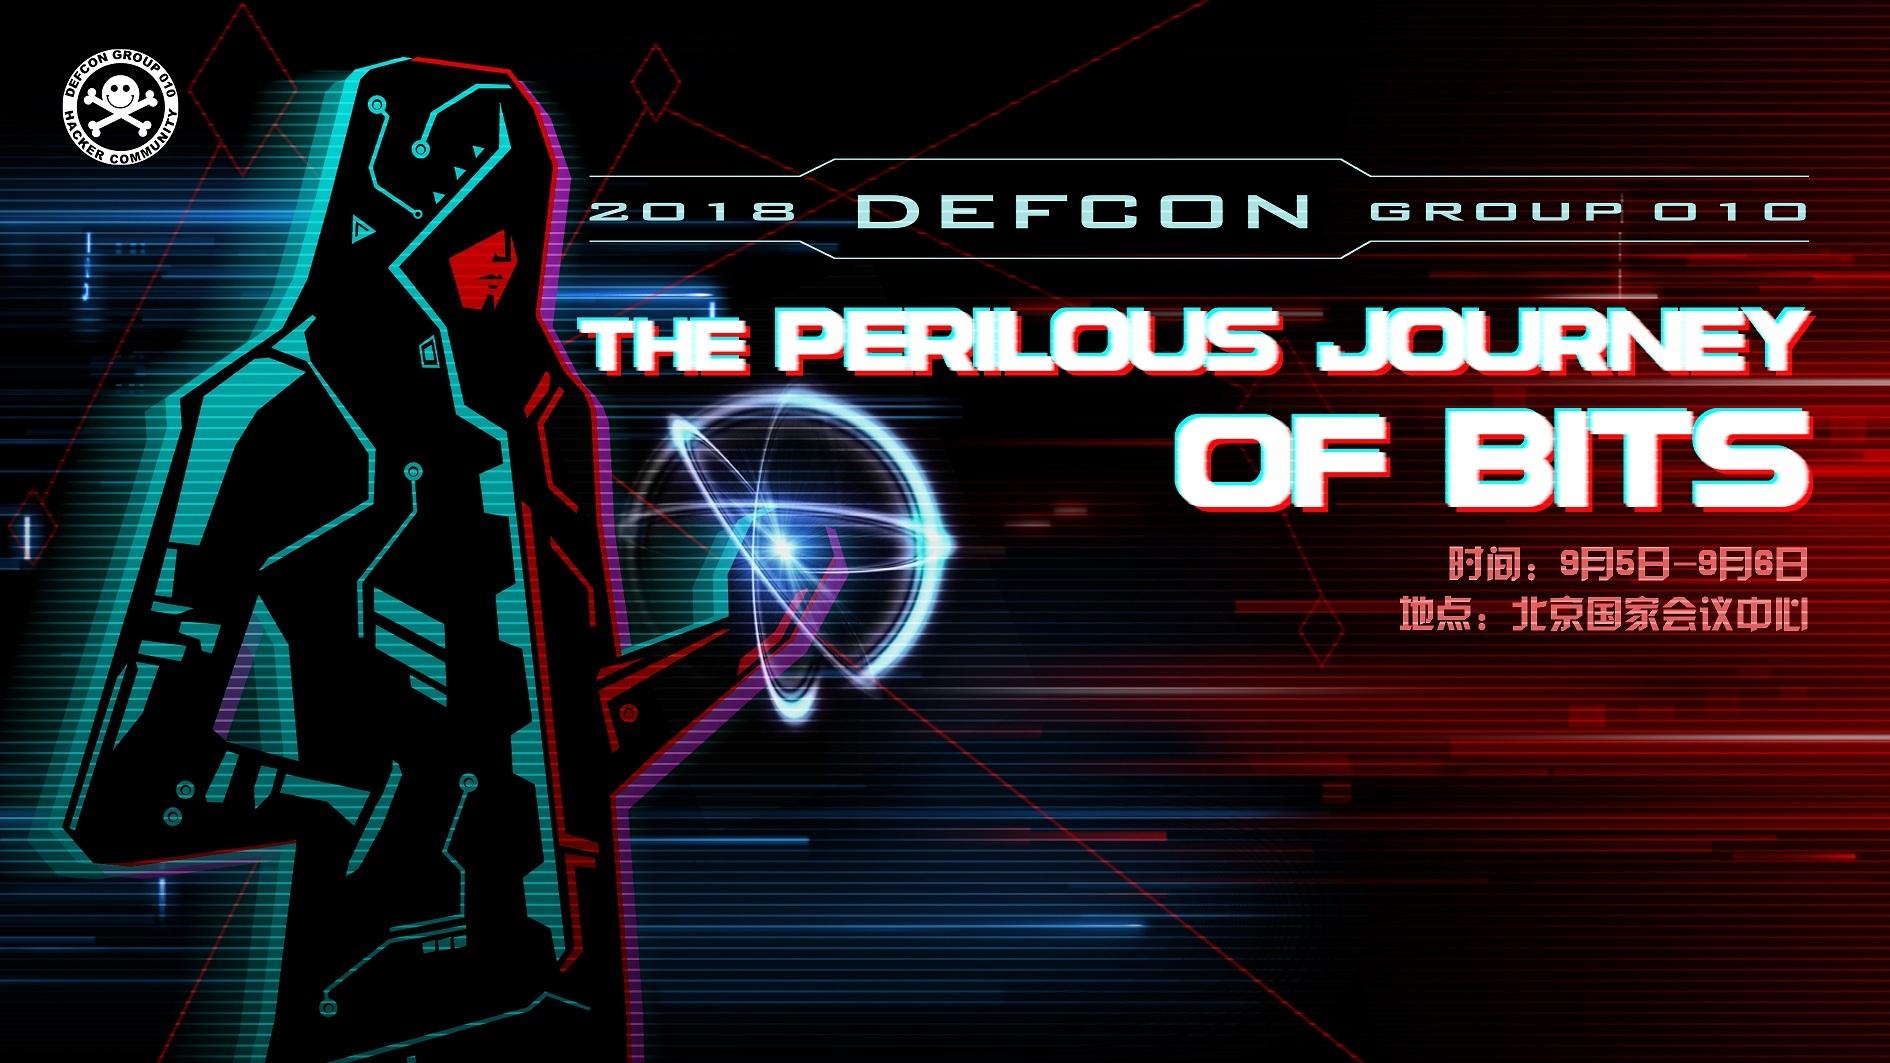 DEFCON GROUPS 黑客大会